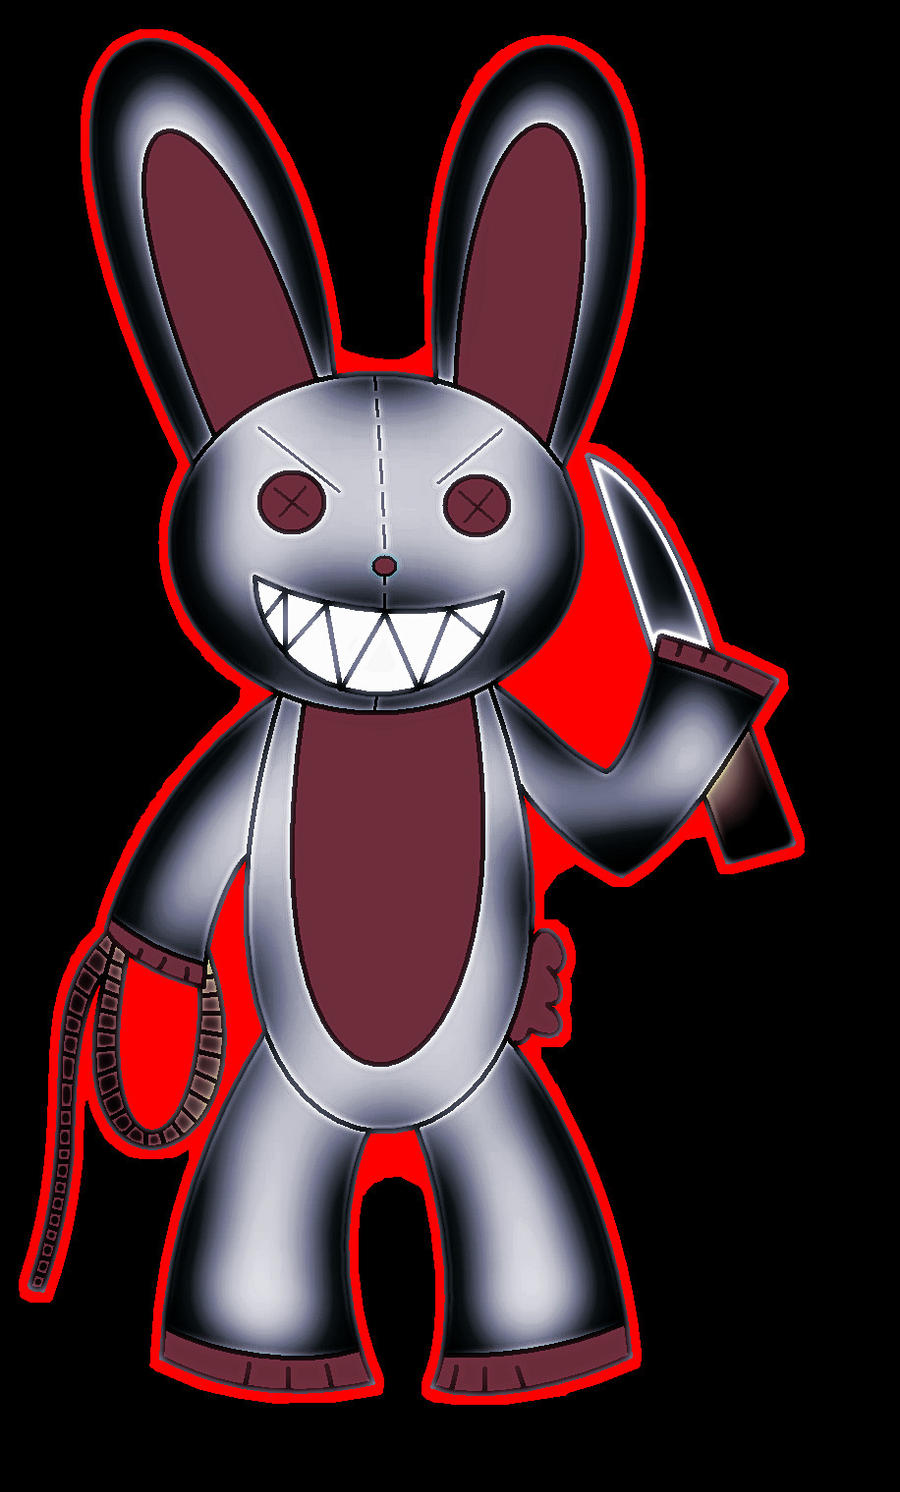 Evil Rabbit by RaphaelaTheTurtel on DeviantArt - photo#12